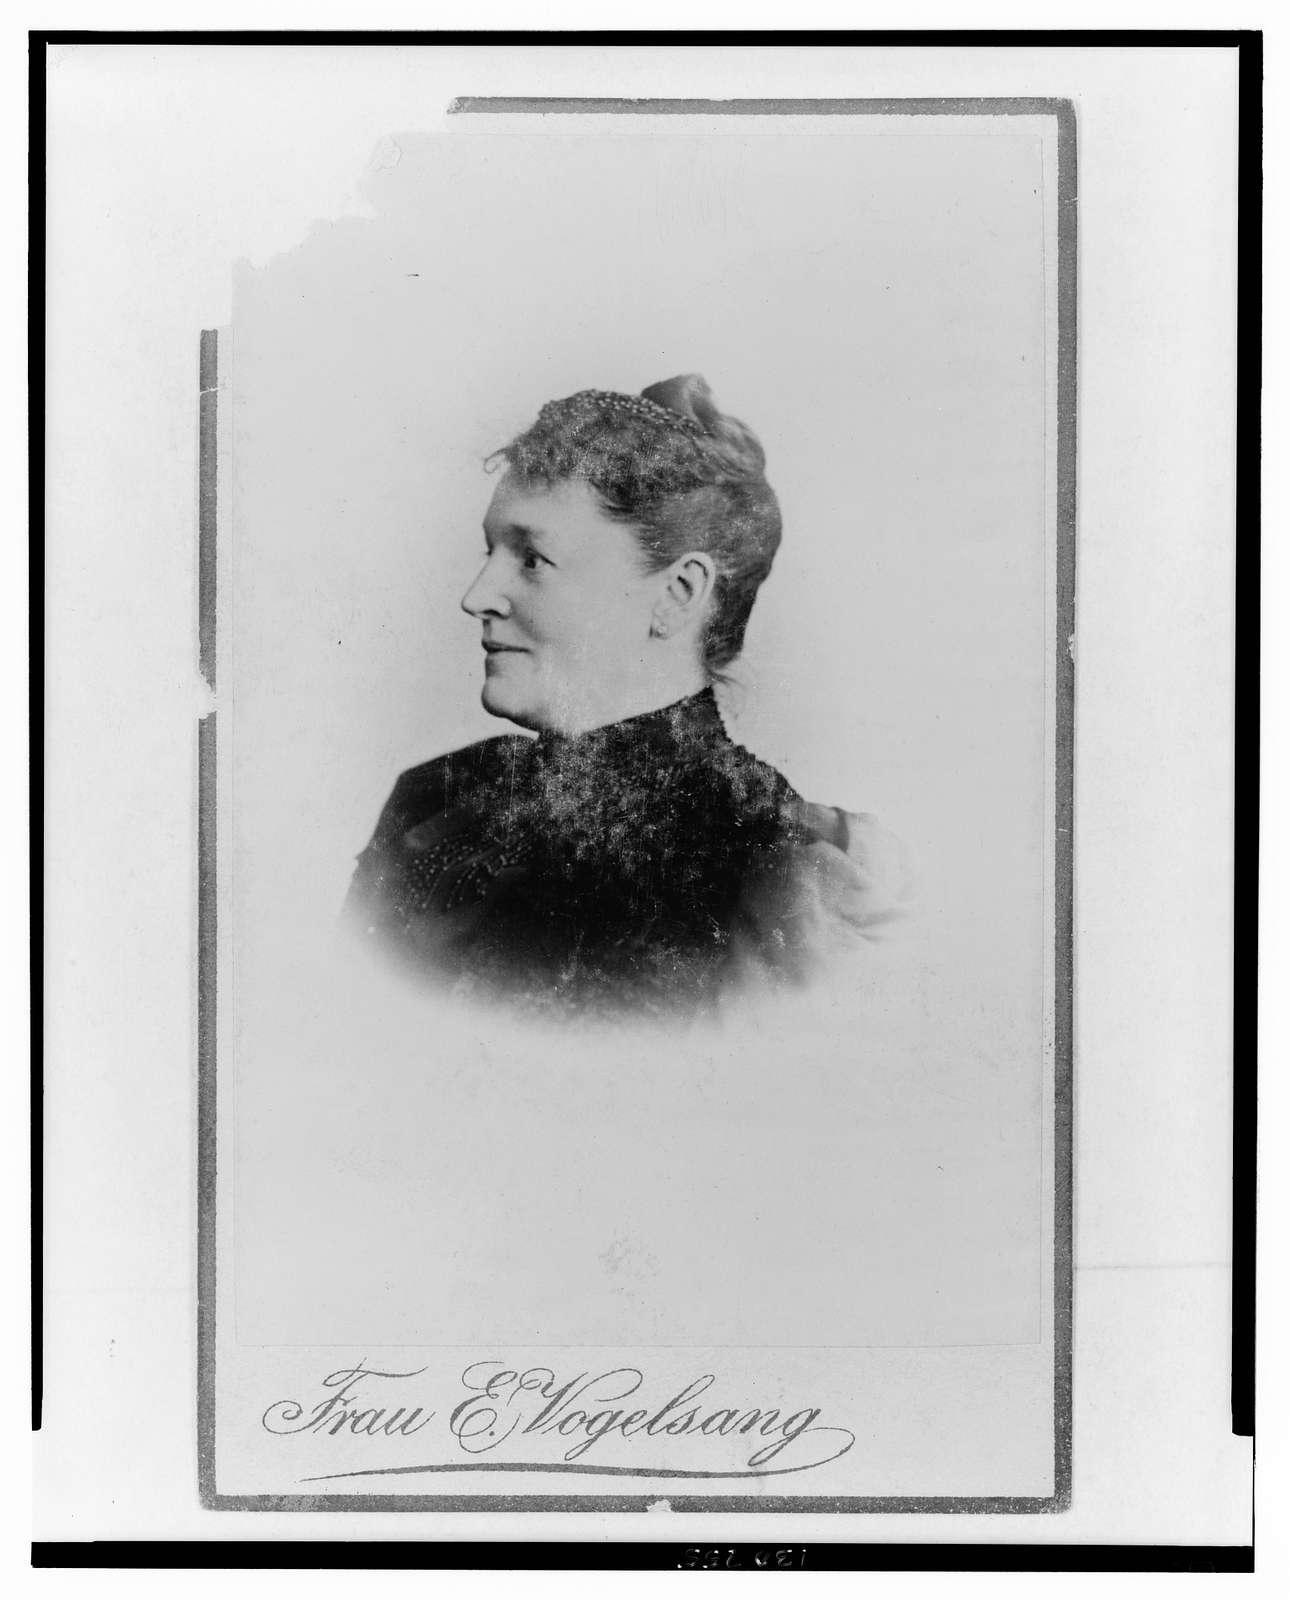 [Hedwig Heyl, German home economics authority, head-and-shoulders portrait, facing left] / Frau E. Vogelsang.